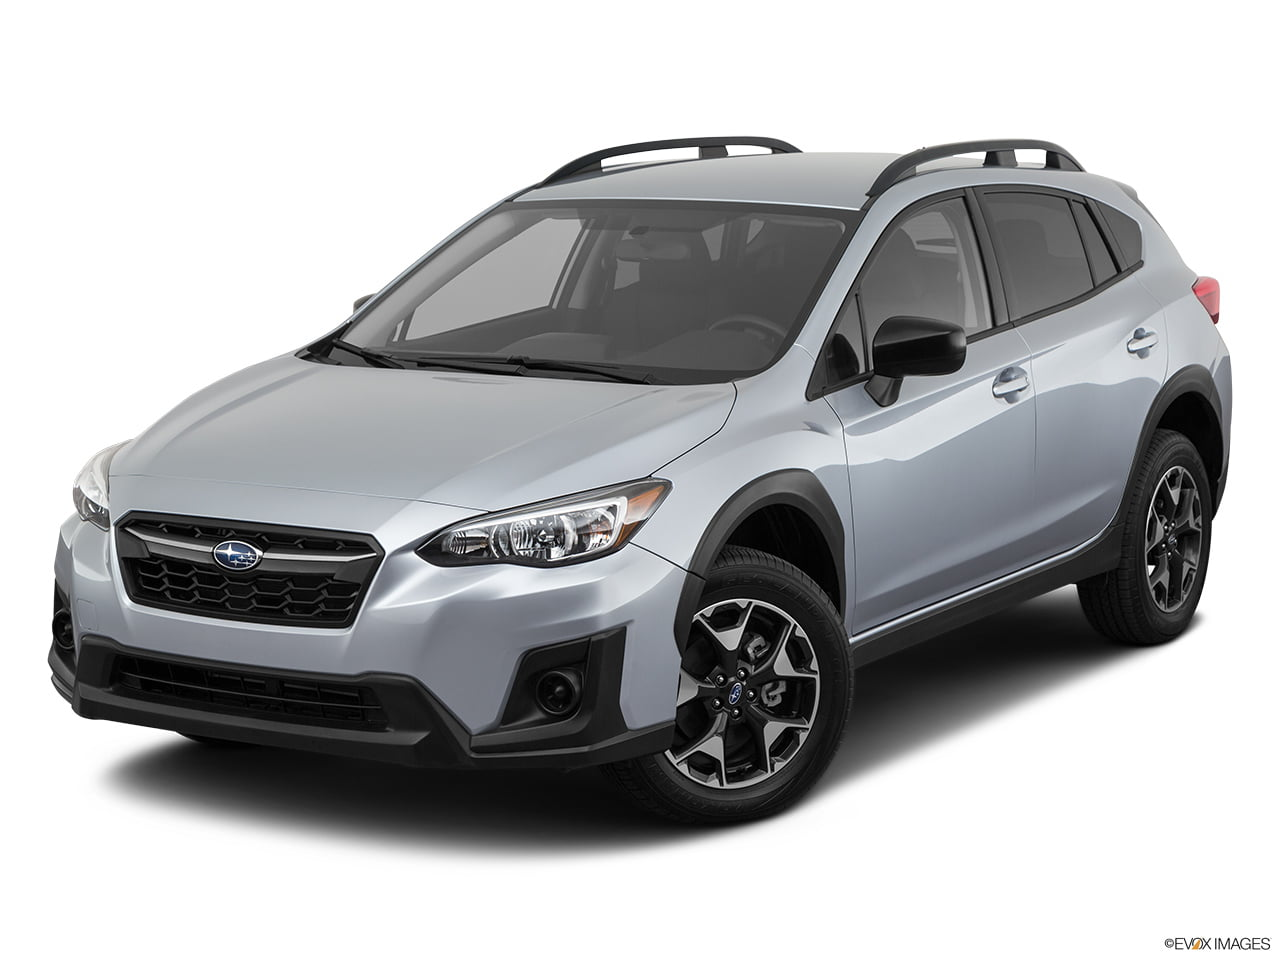 2020 Subaru Crosstrek Leasing (Best Car Lease Deals ...